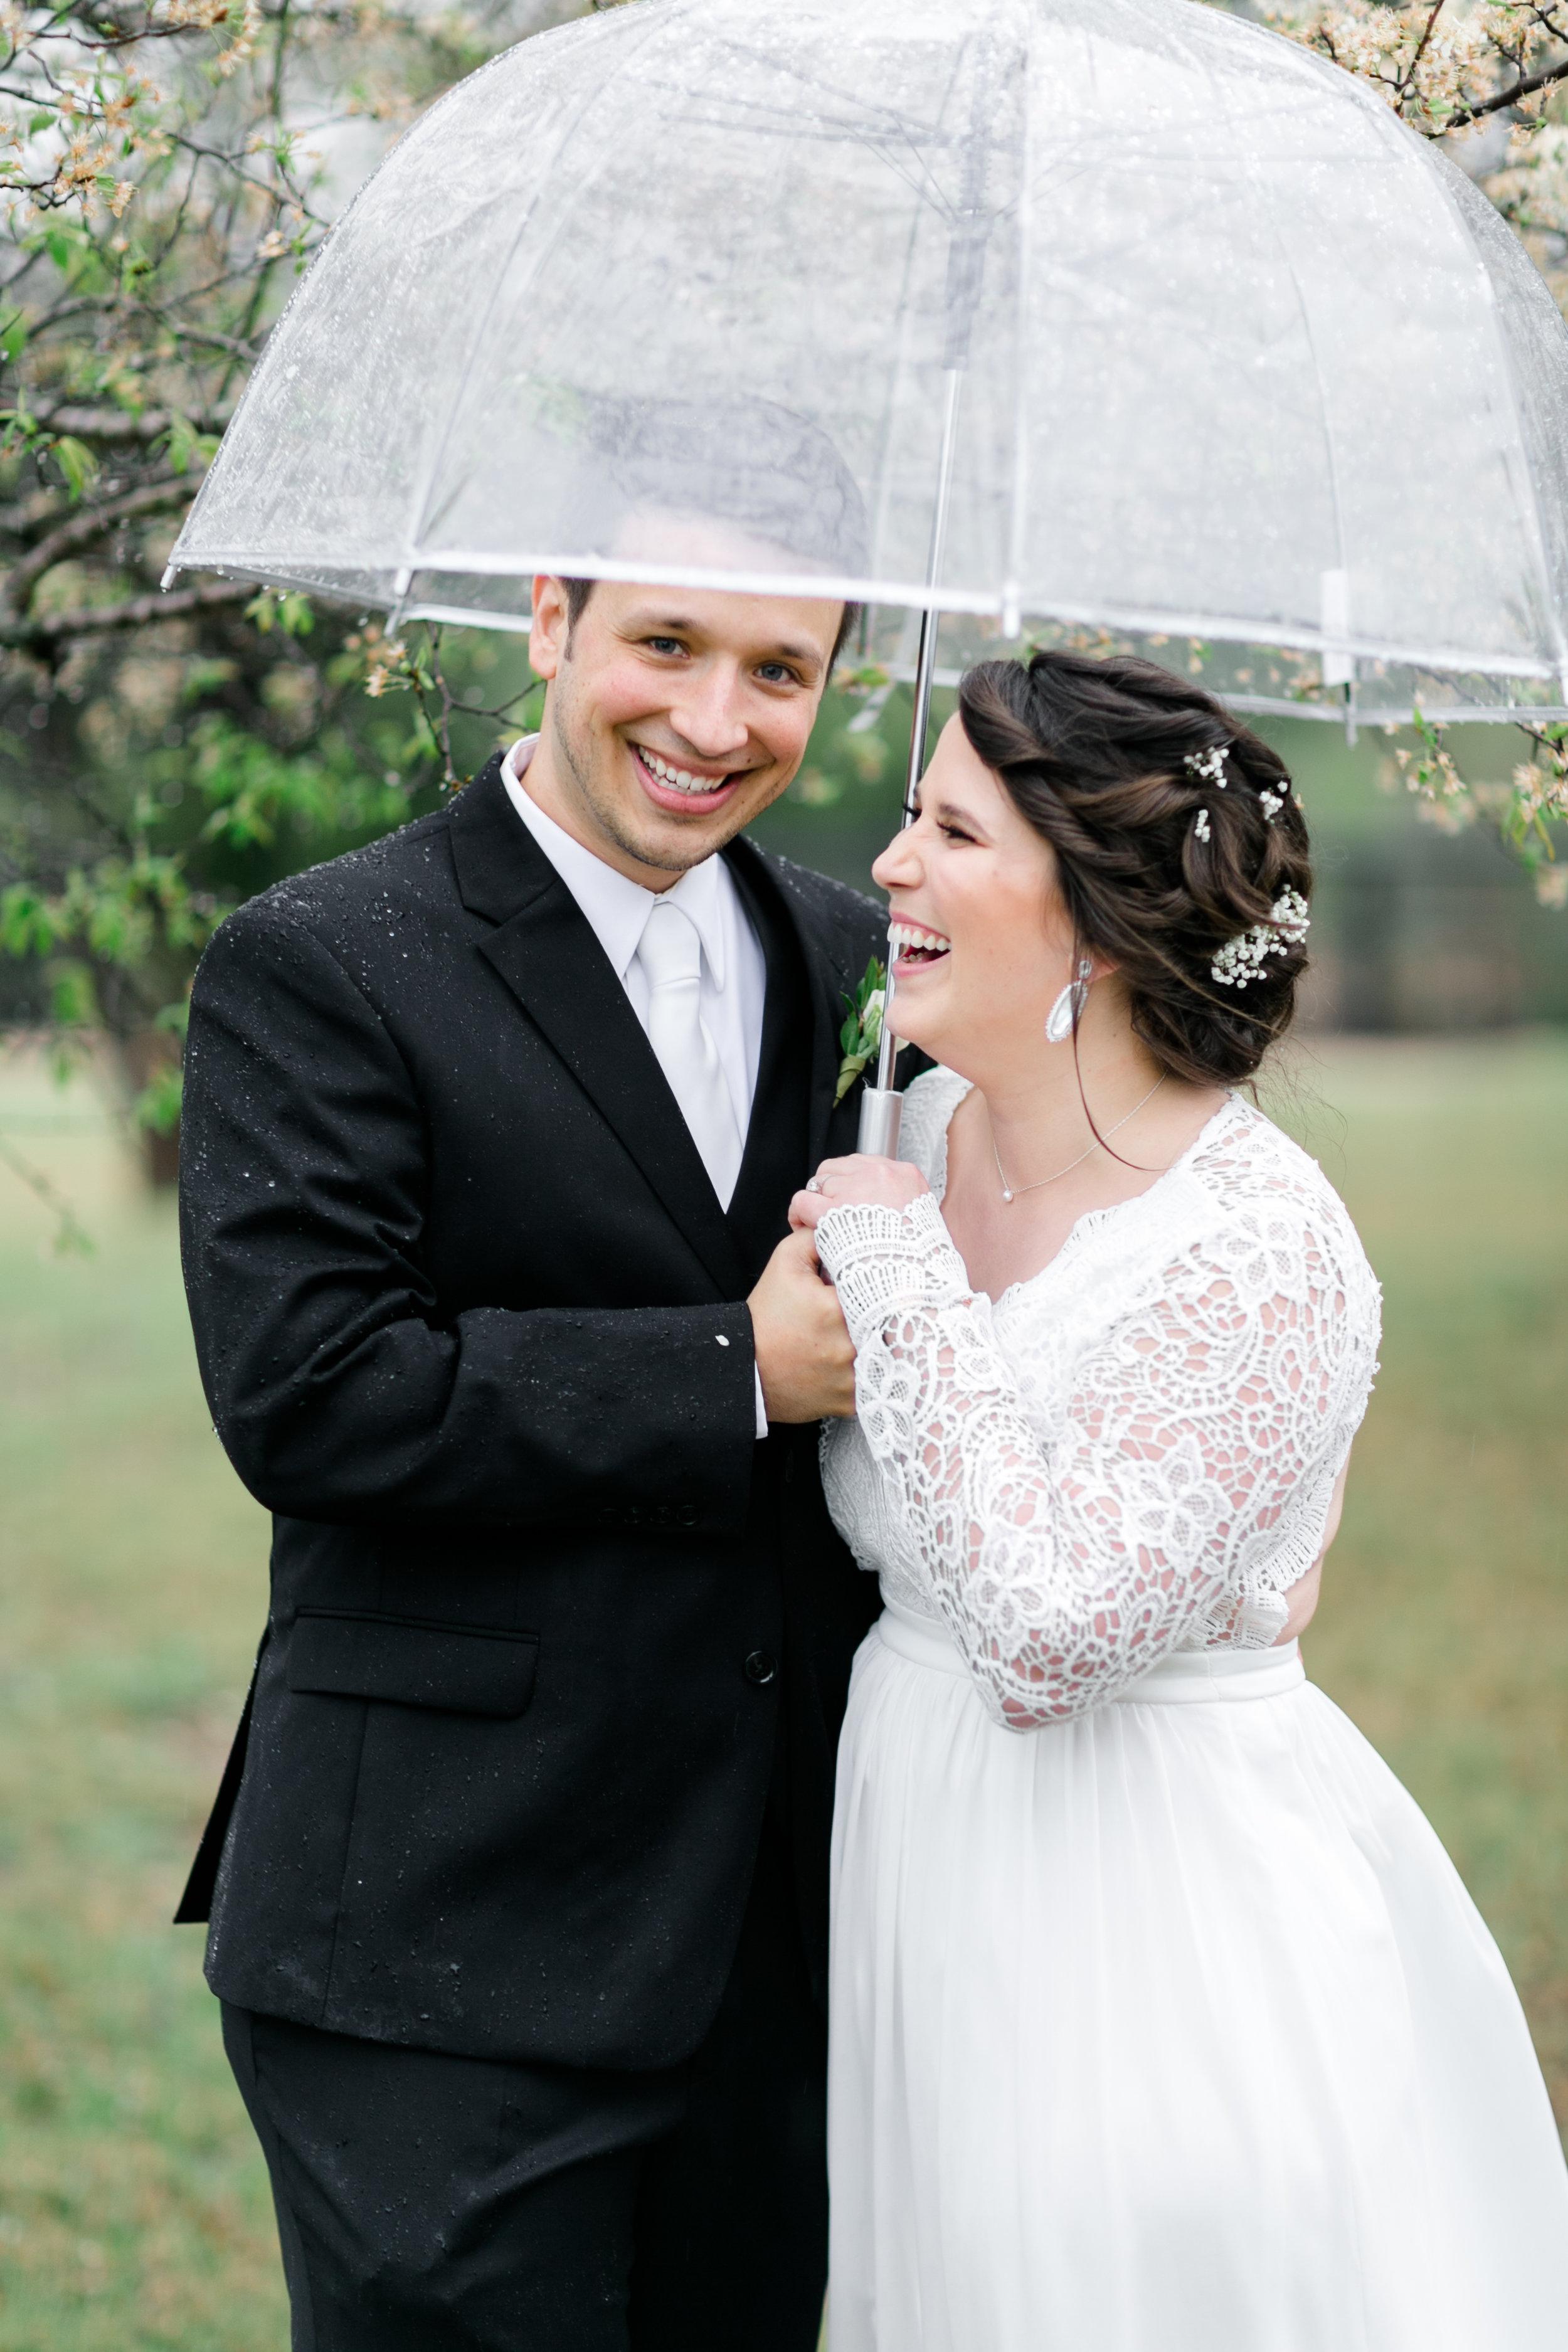 Austin_Texas_Fine_Art_Wedding_Photographer_Kayla_Snell_Photography_Antebellum_Oaks216.jpg